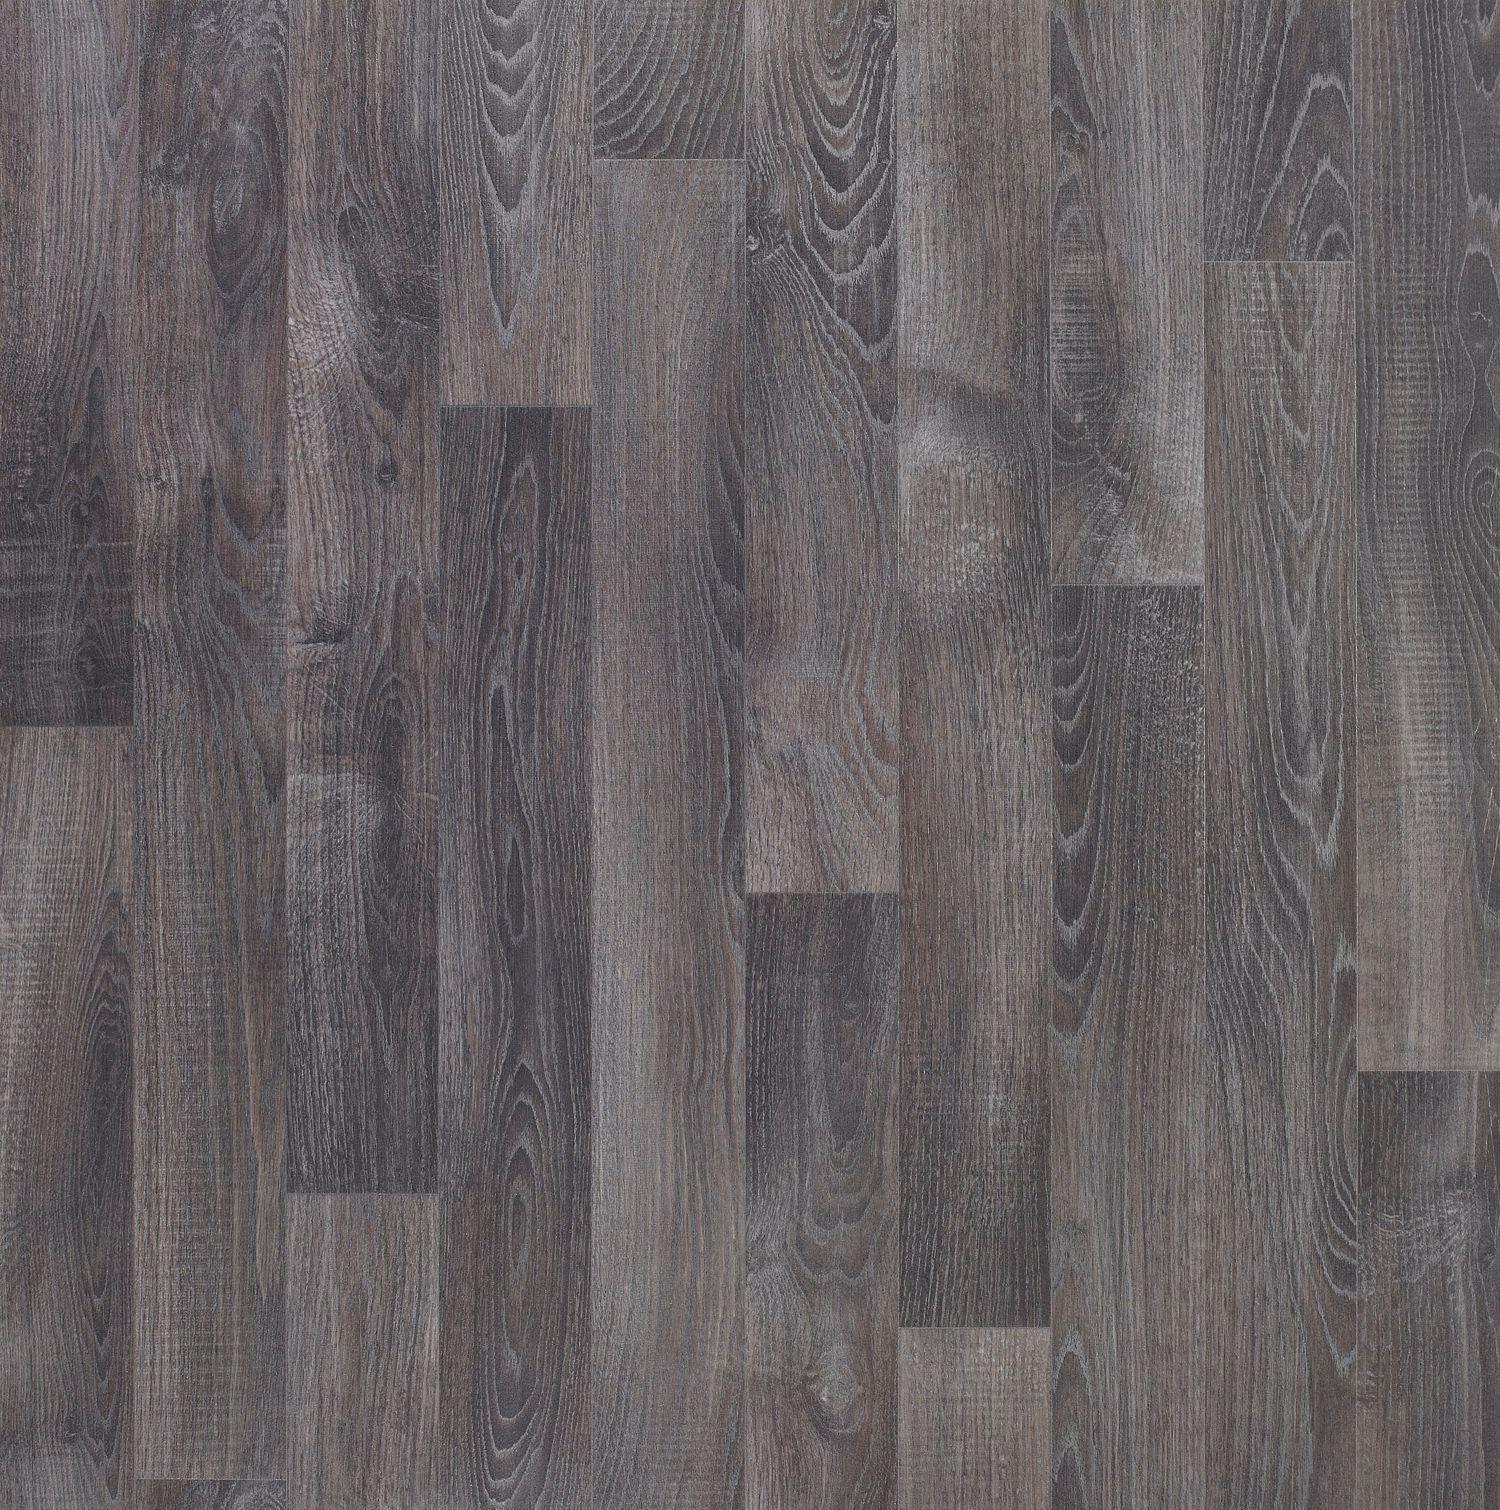 Dark grey oak effect vinyl flooring 4 m dark grey dark and gray dark grey oak effect vinyl flooring 4 m dailygadgetfo Choice Image